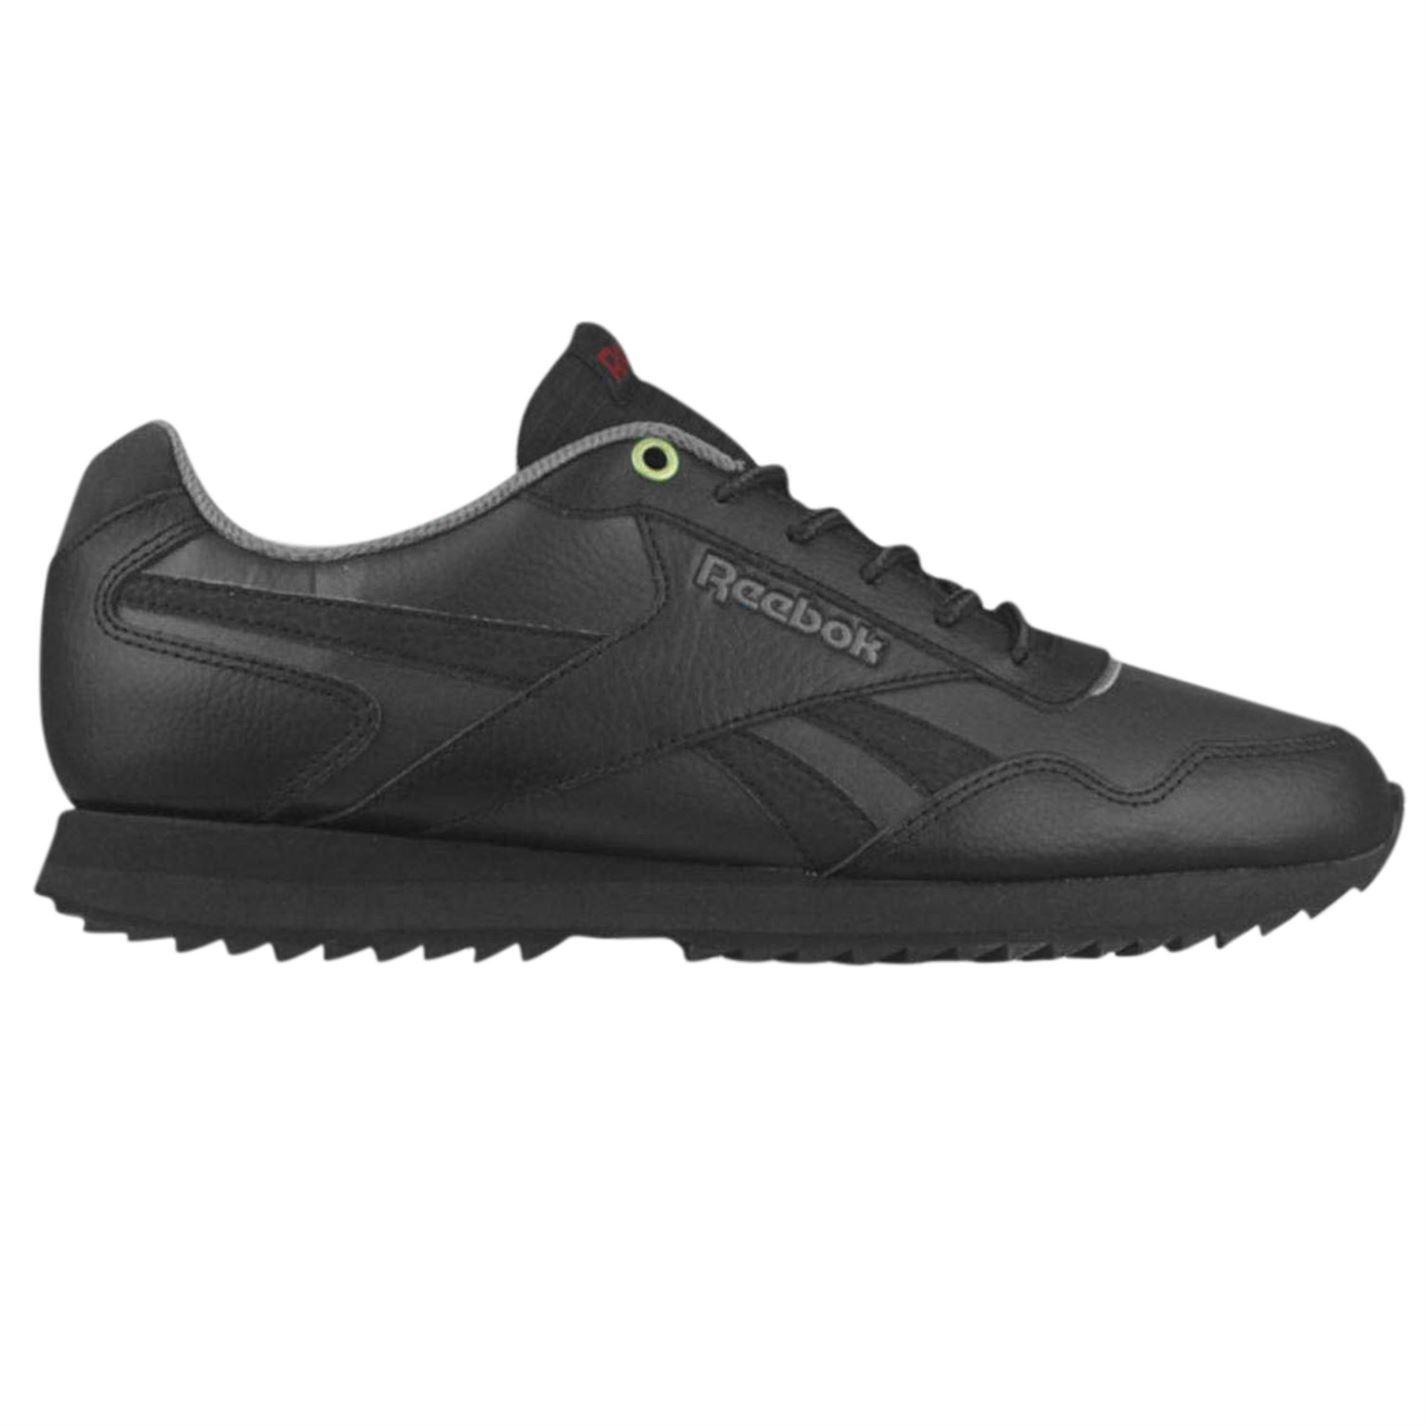 Glide Black darkgrey Sneaker Lacci Royal uomo fissati Mens da Runner Gents Ventilated Reebok 6q5wPxq